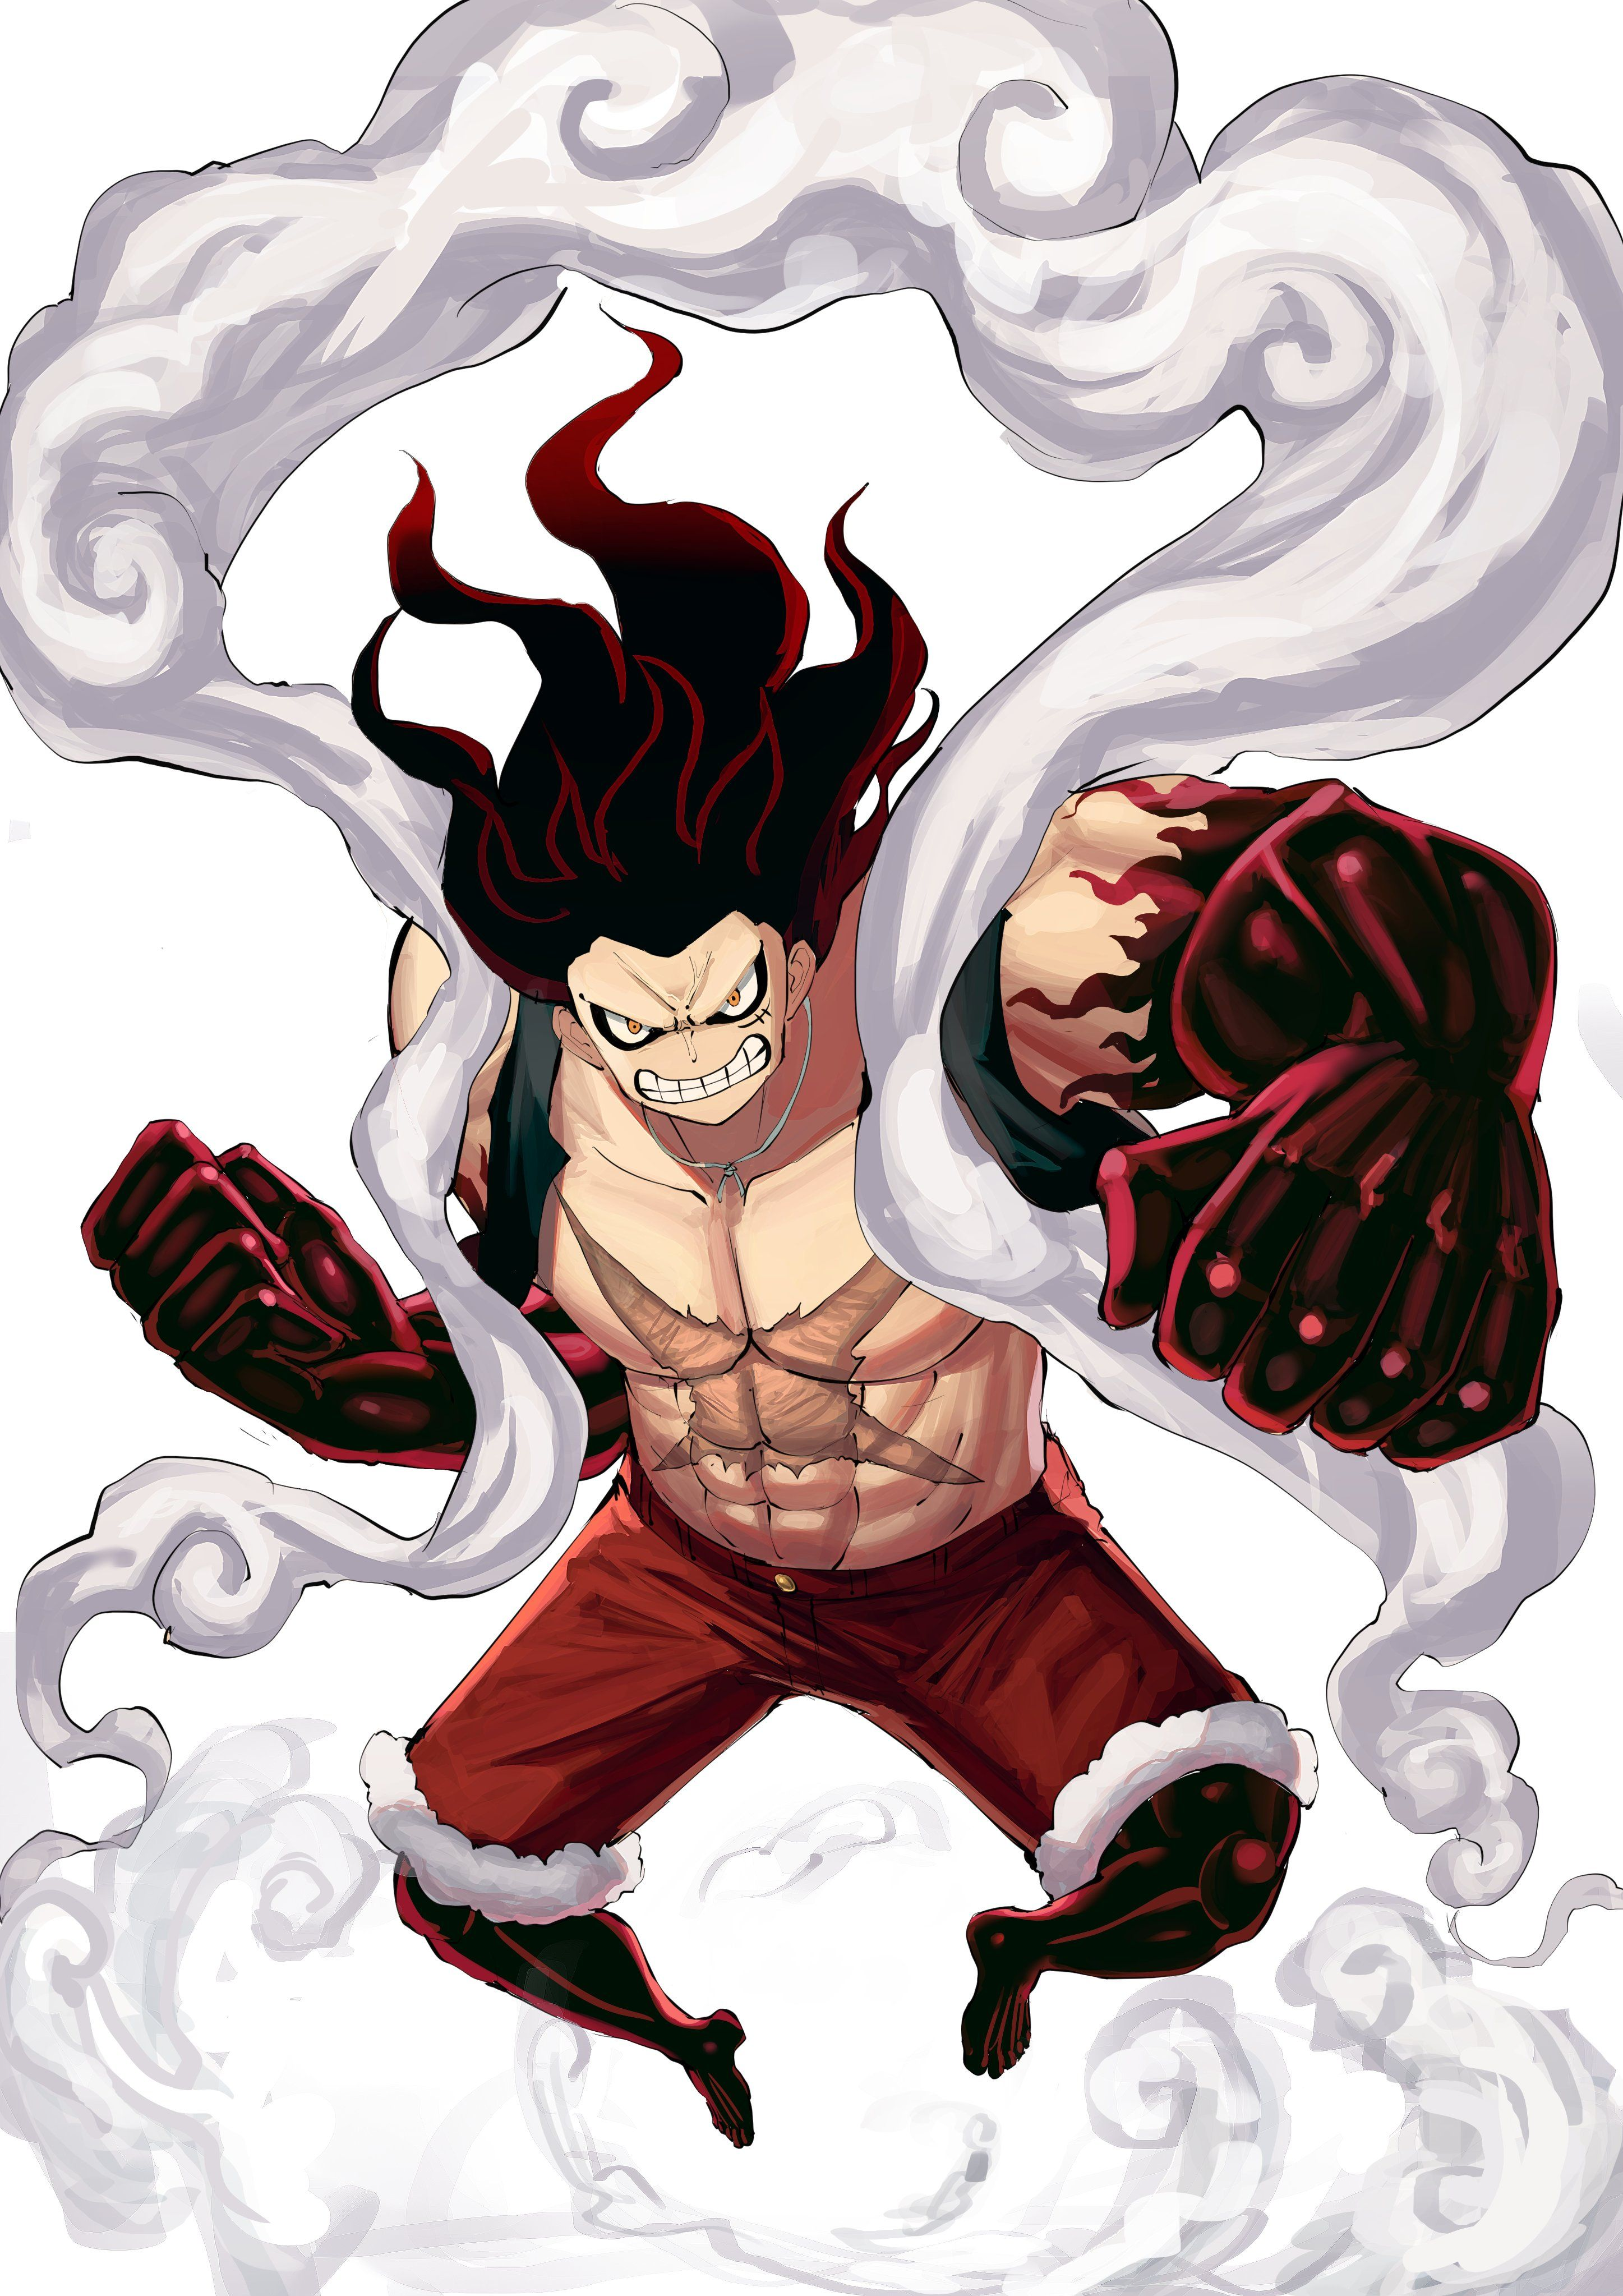 Mazel On Twitter In 2021 One Piece Movies One Piece Drawing One Piece Manga